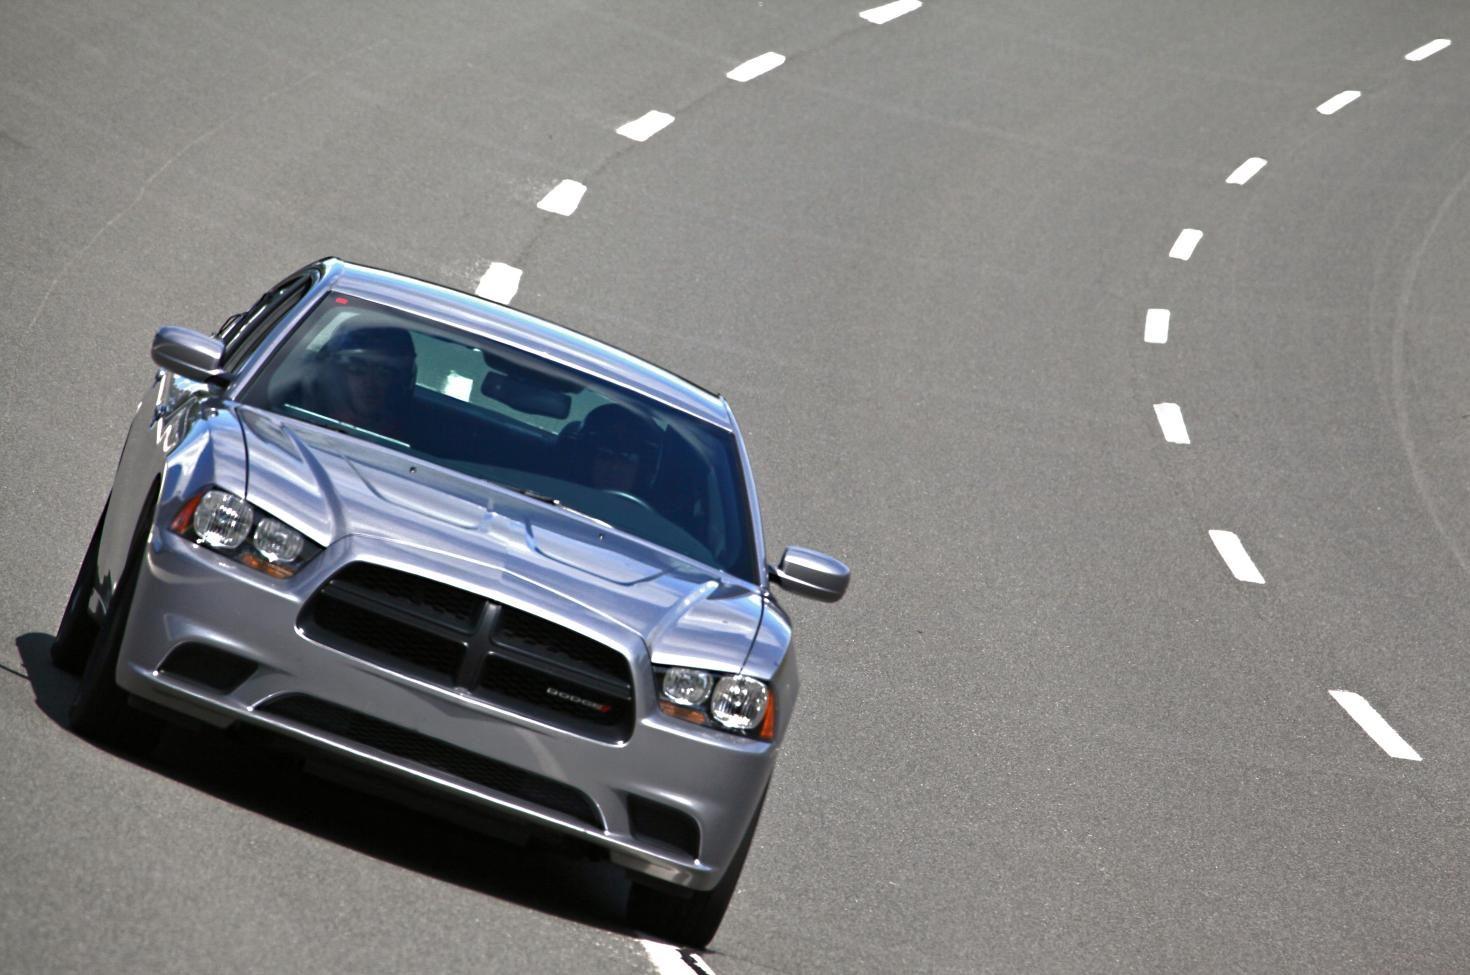 Dodge Charger Deemed Baddest, Briskest Cop Car: Latest News – Surf4cars